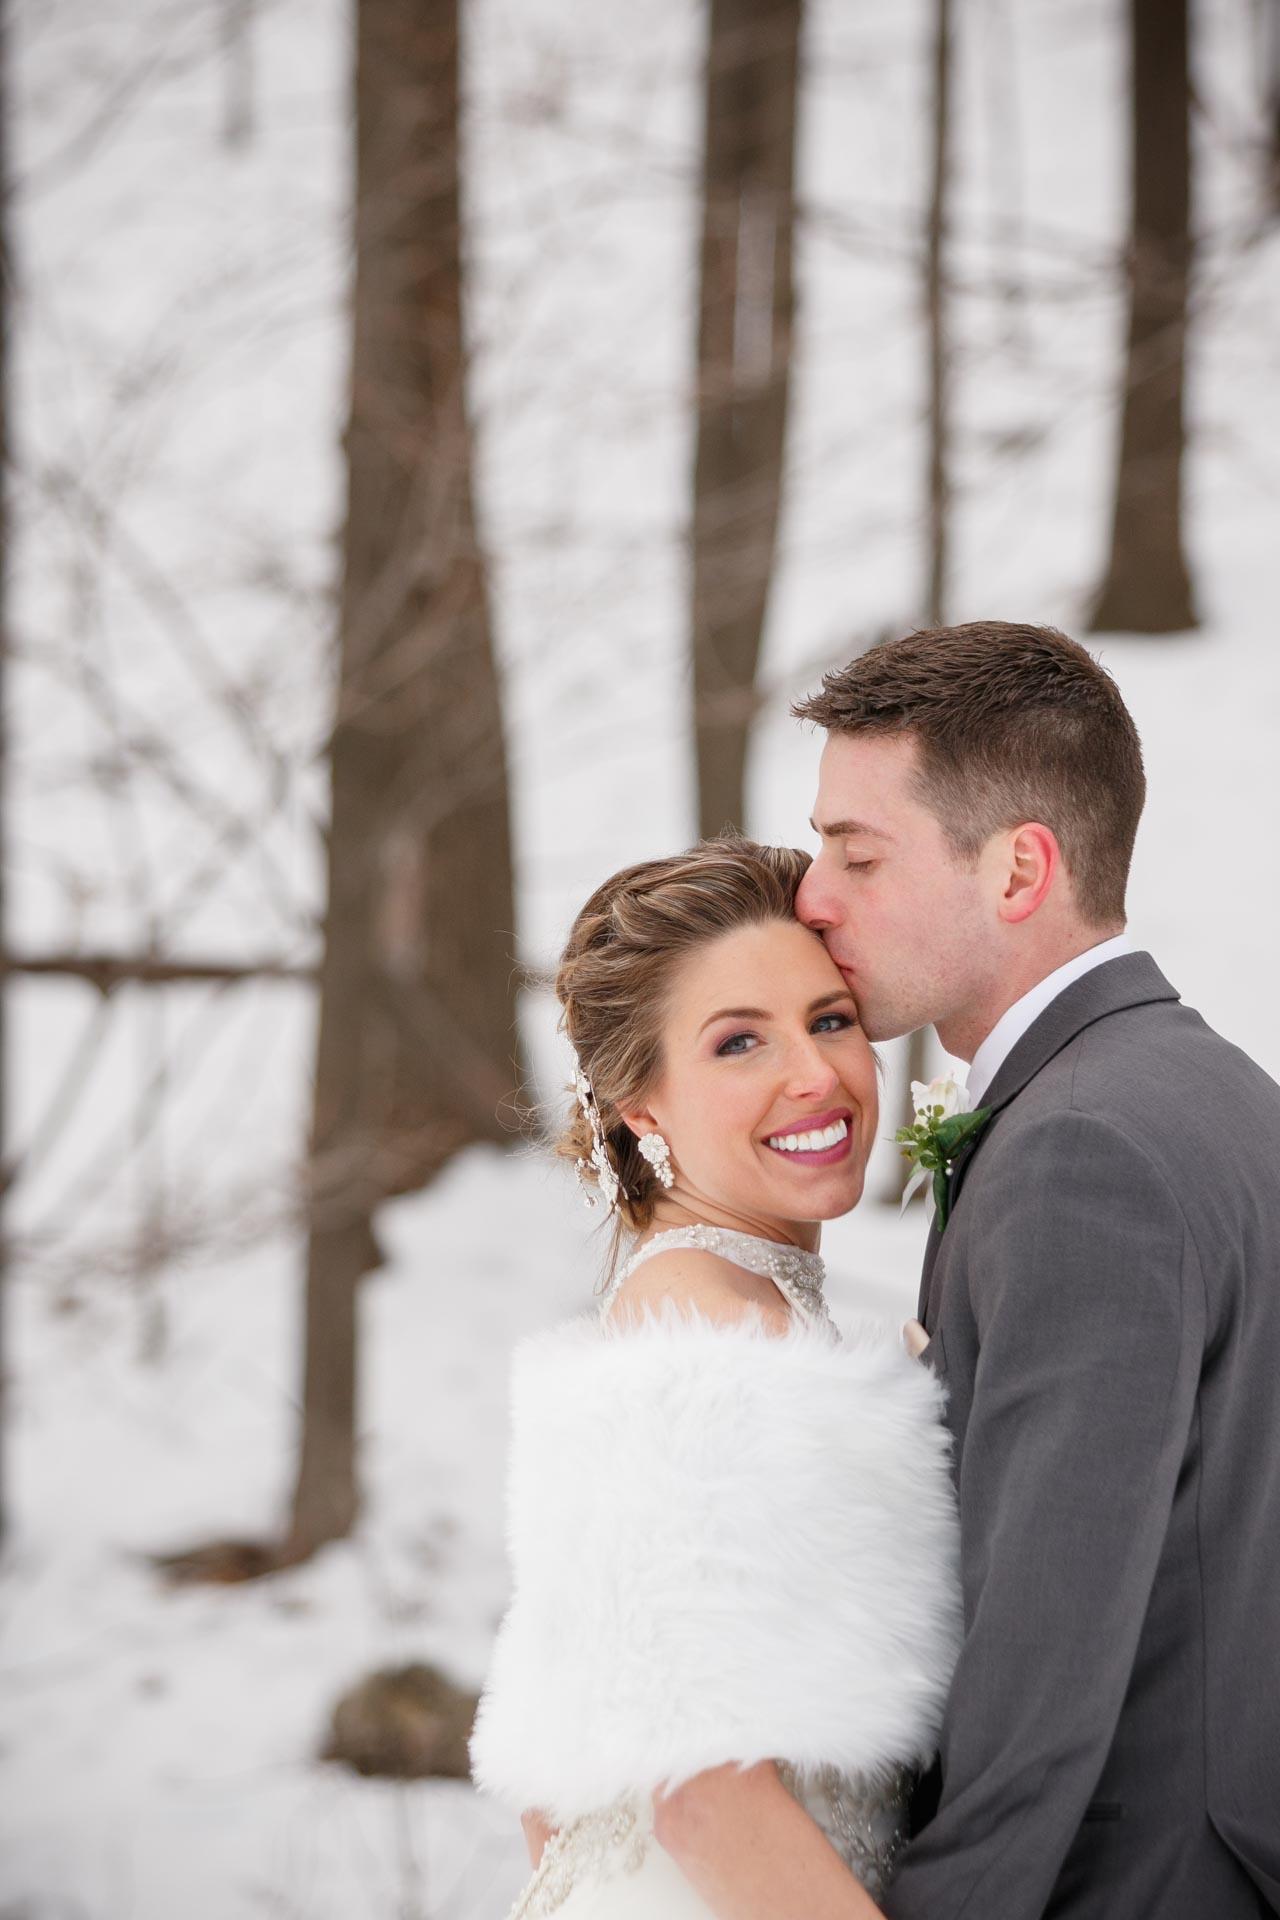 wedding-adam-shea-photography-green-bay-appleton-neenah-photographer-26.jpg